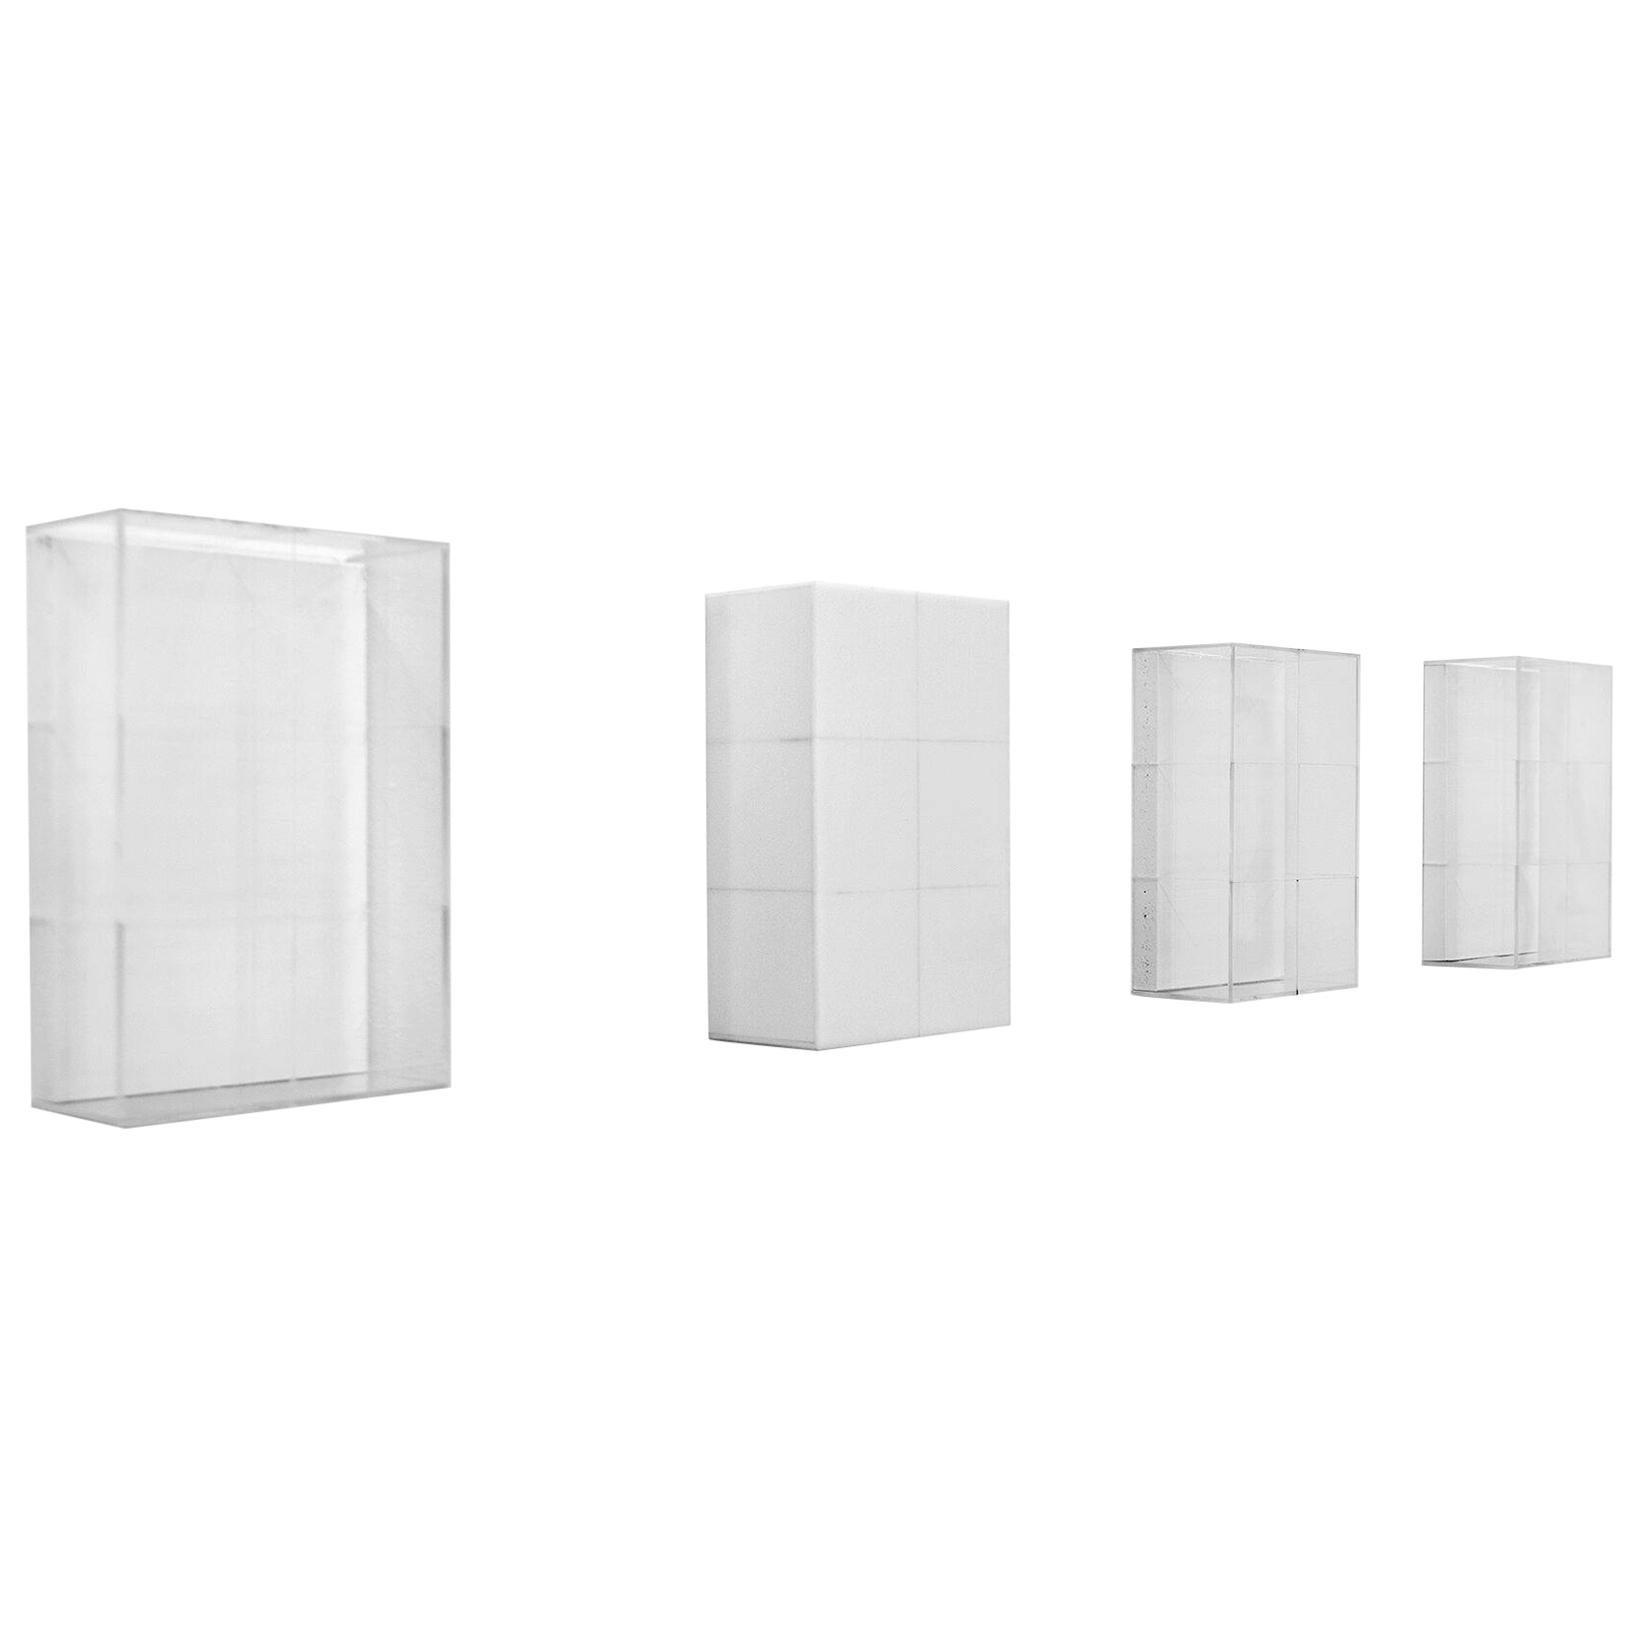 Etapas 1-4 Plexiglass Wall Sculpture Series Edition 1/3